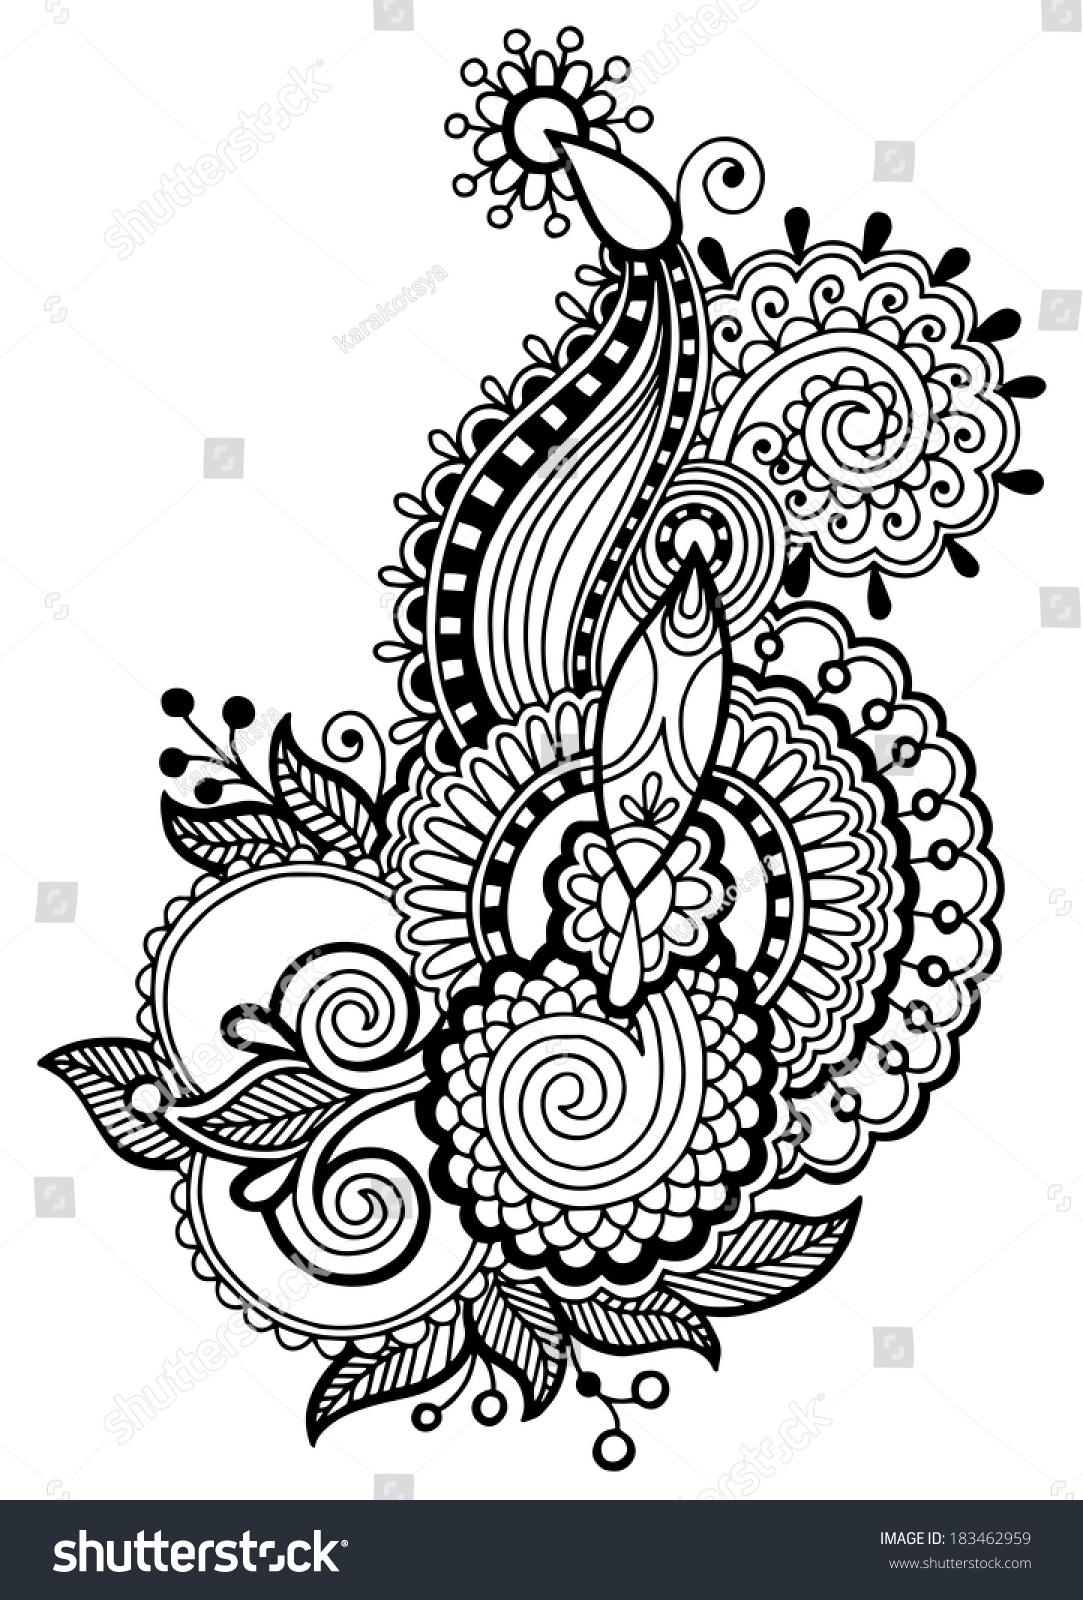 Black And White Hand Drawn Line Art Ornamental Ethnic Flowers